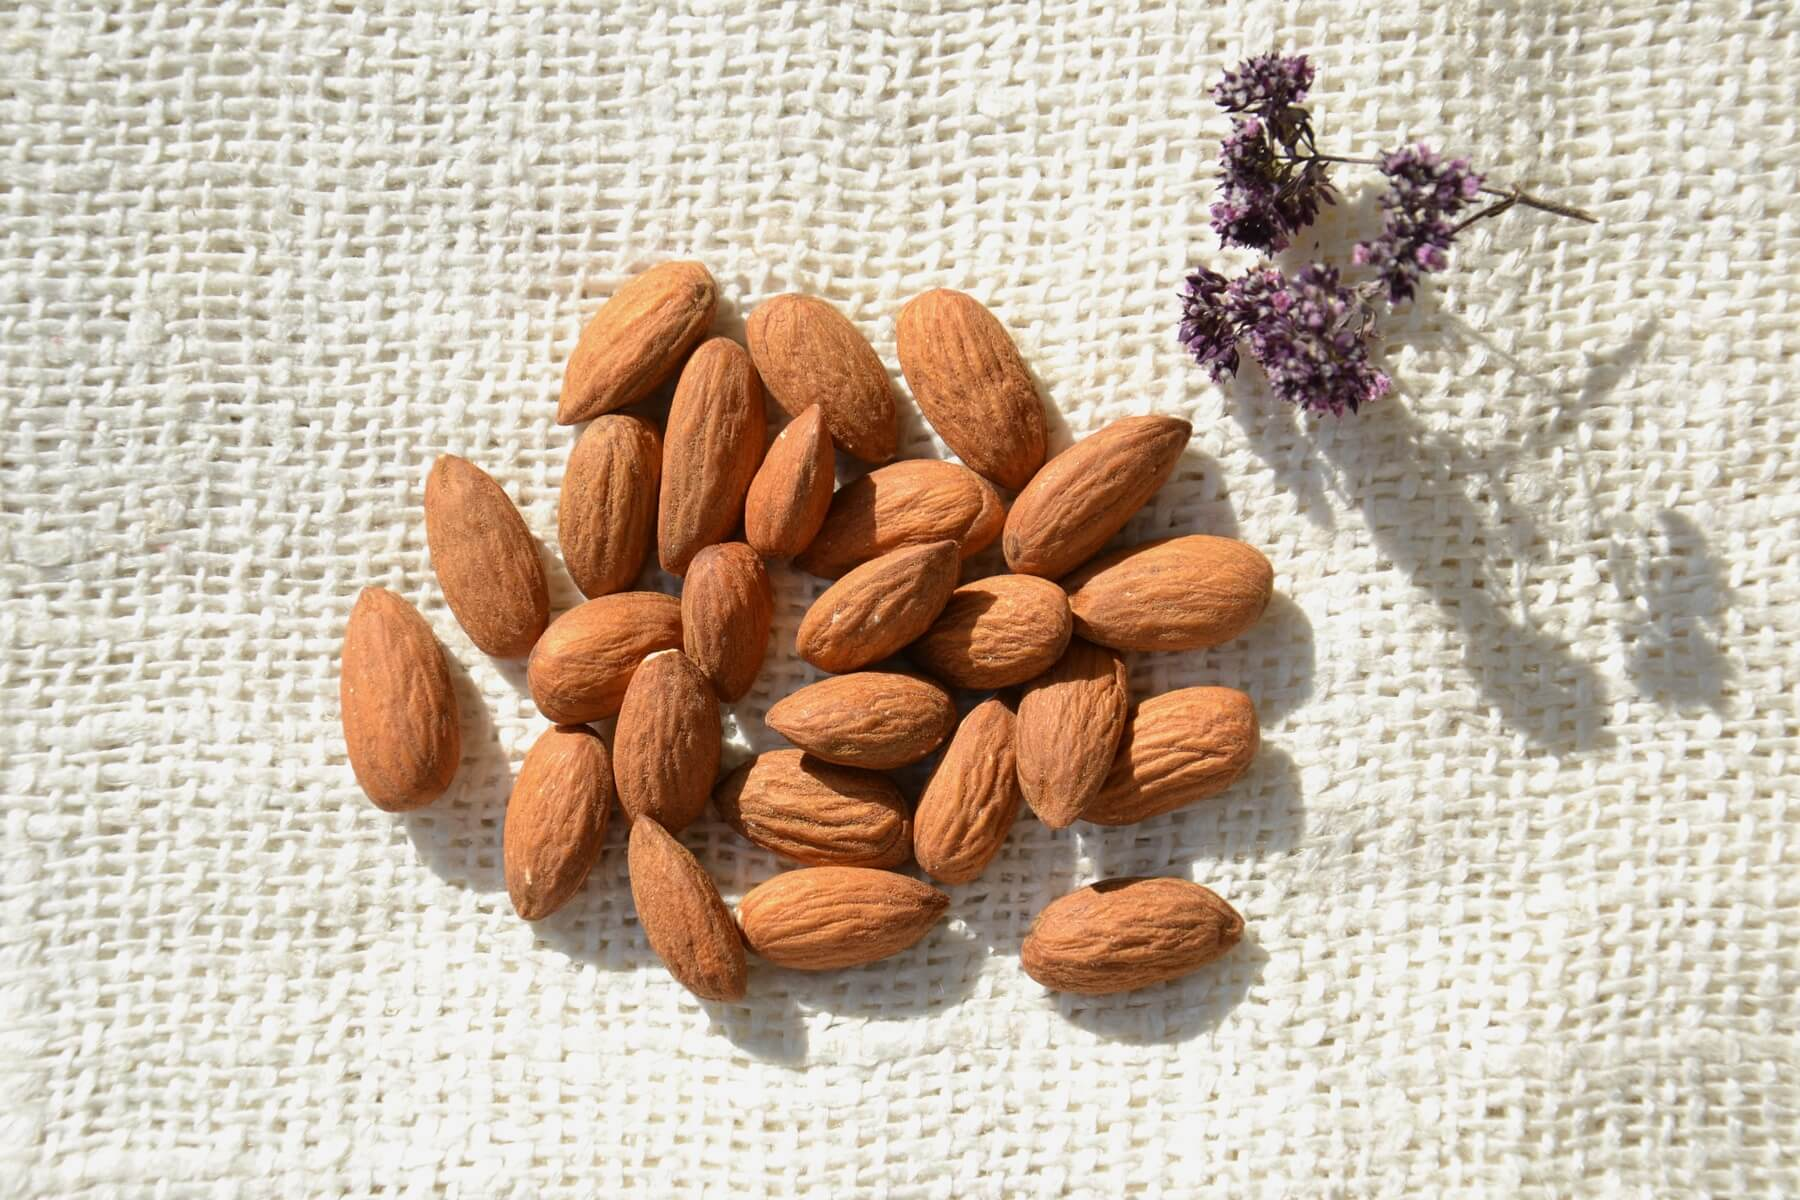 Peanut is Good For Health